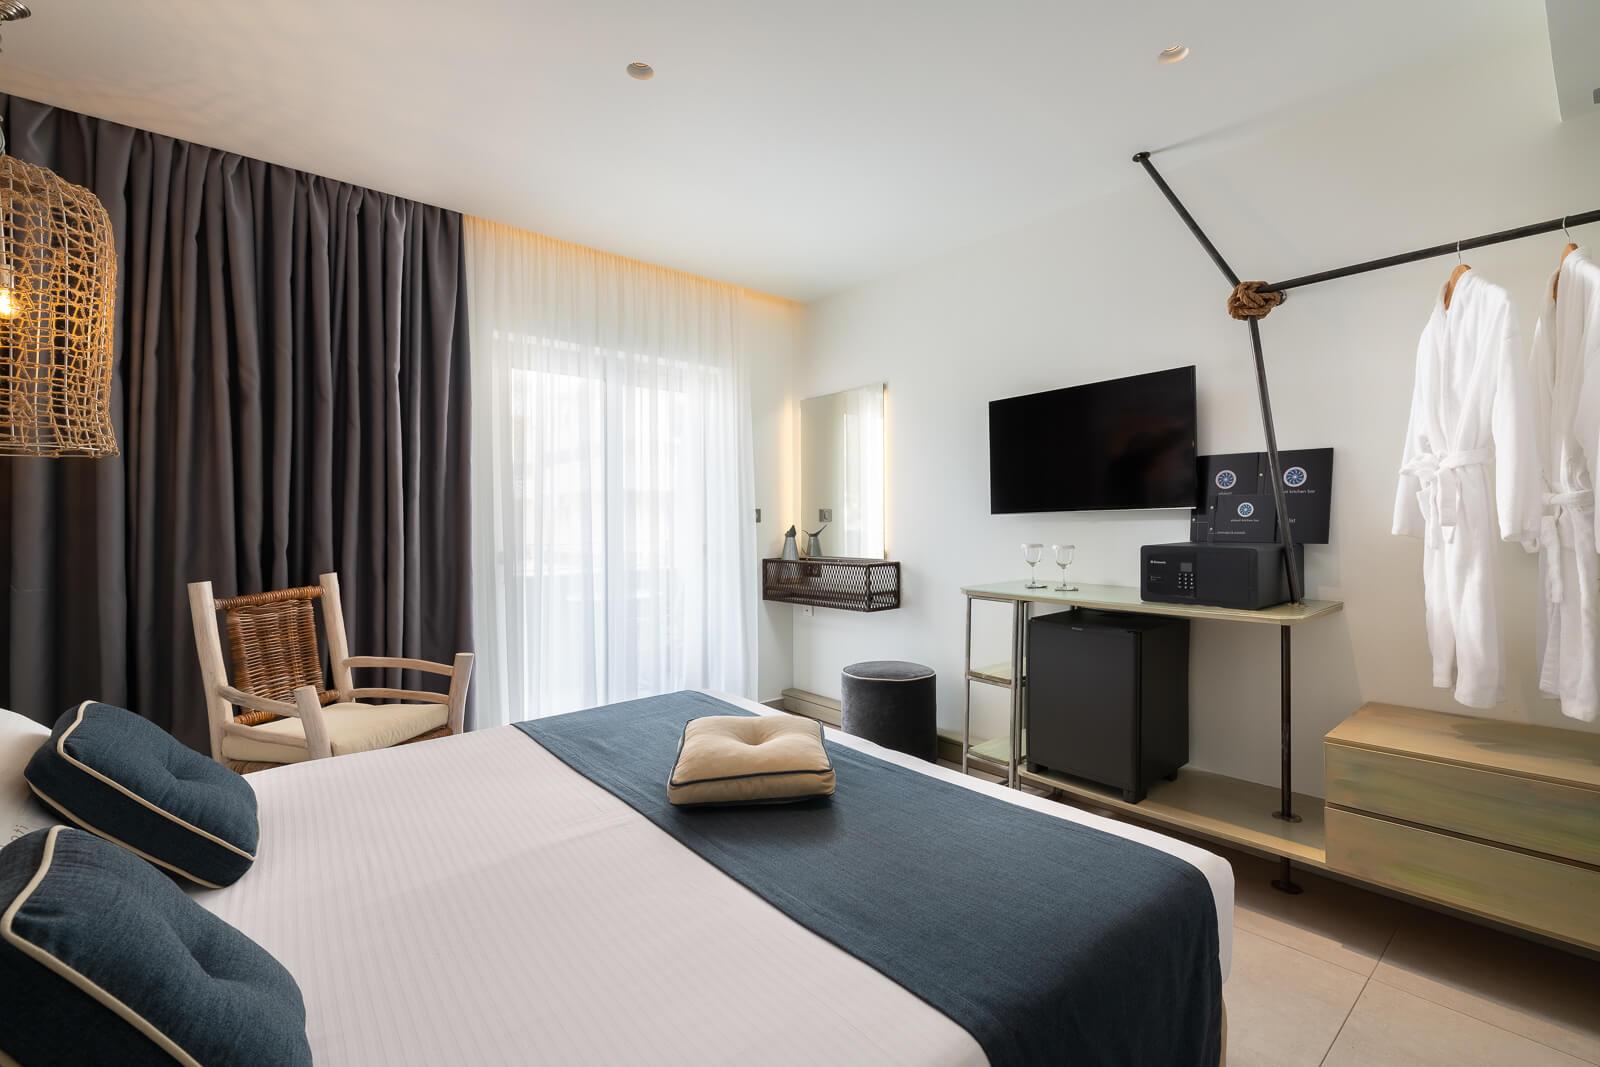 Milos-Hotel-Room-Elakati-Hotel-in-Rhodes